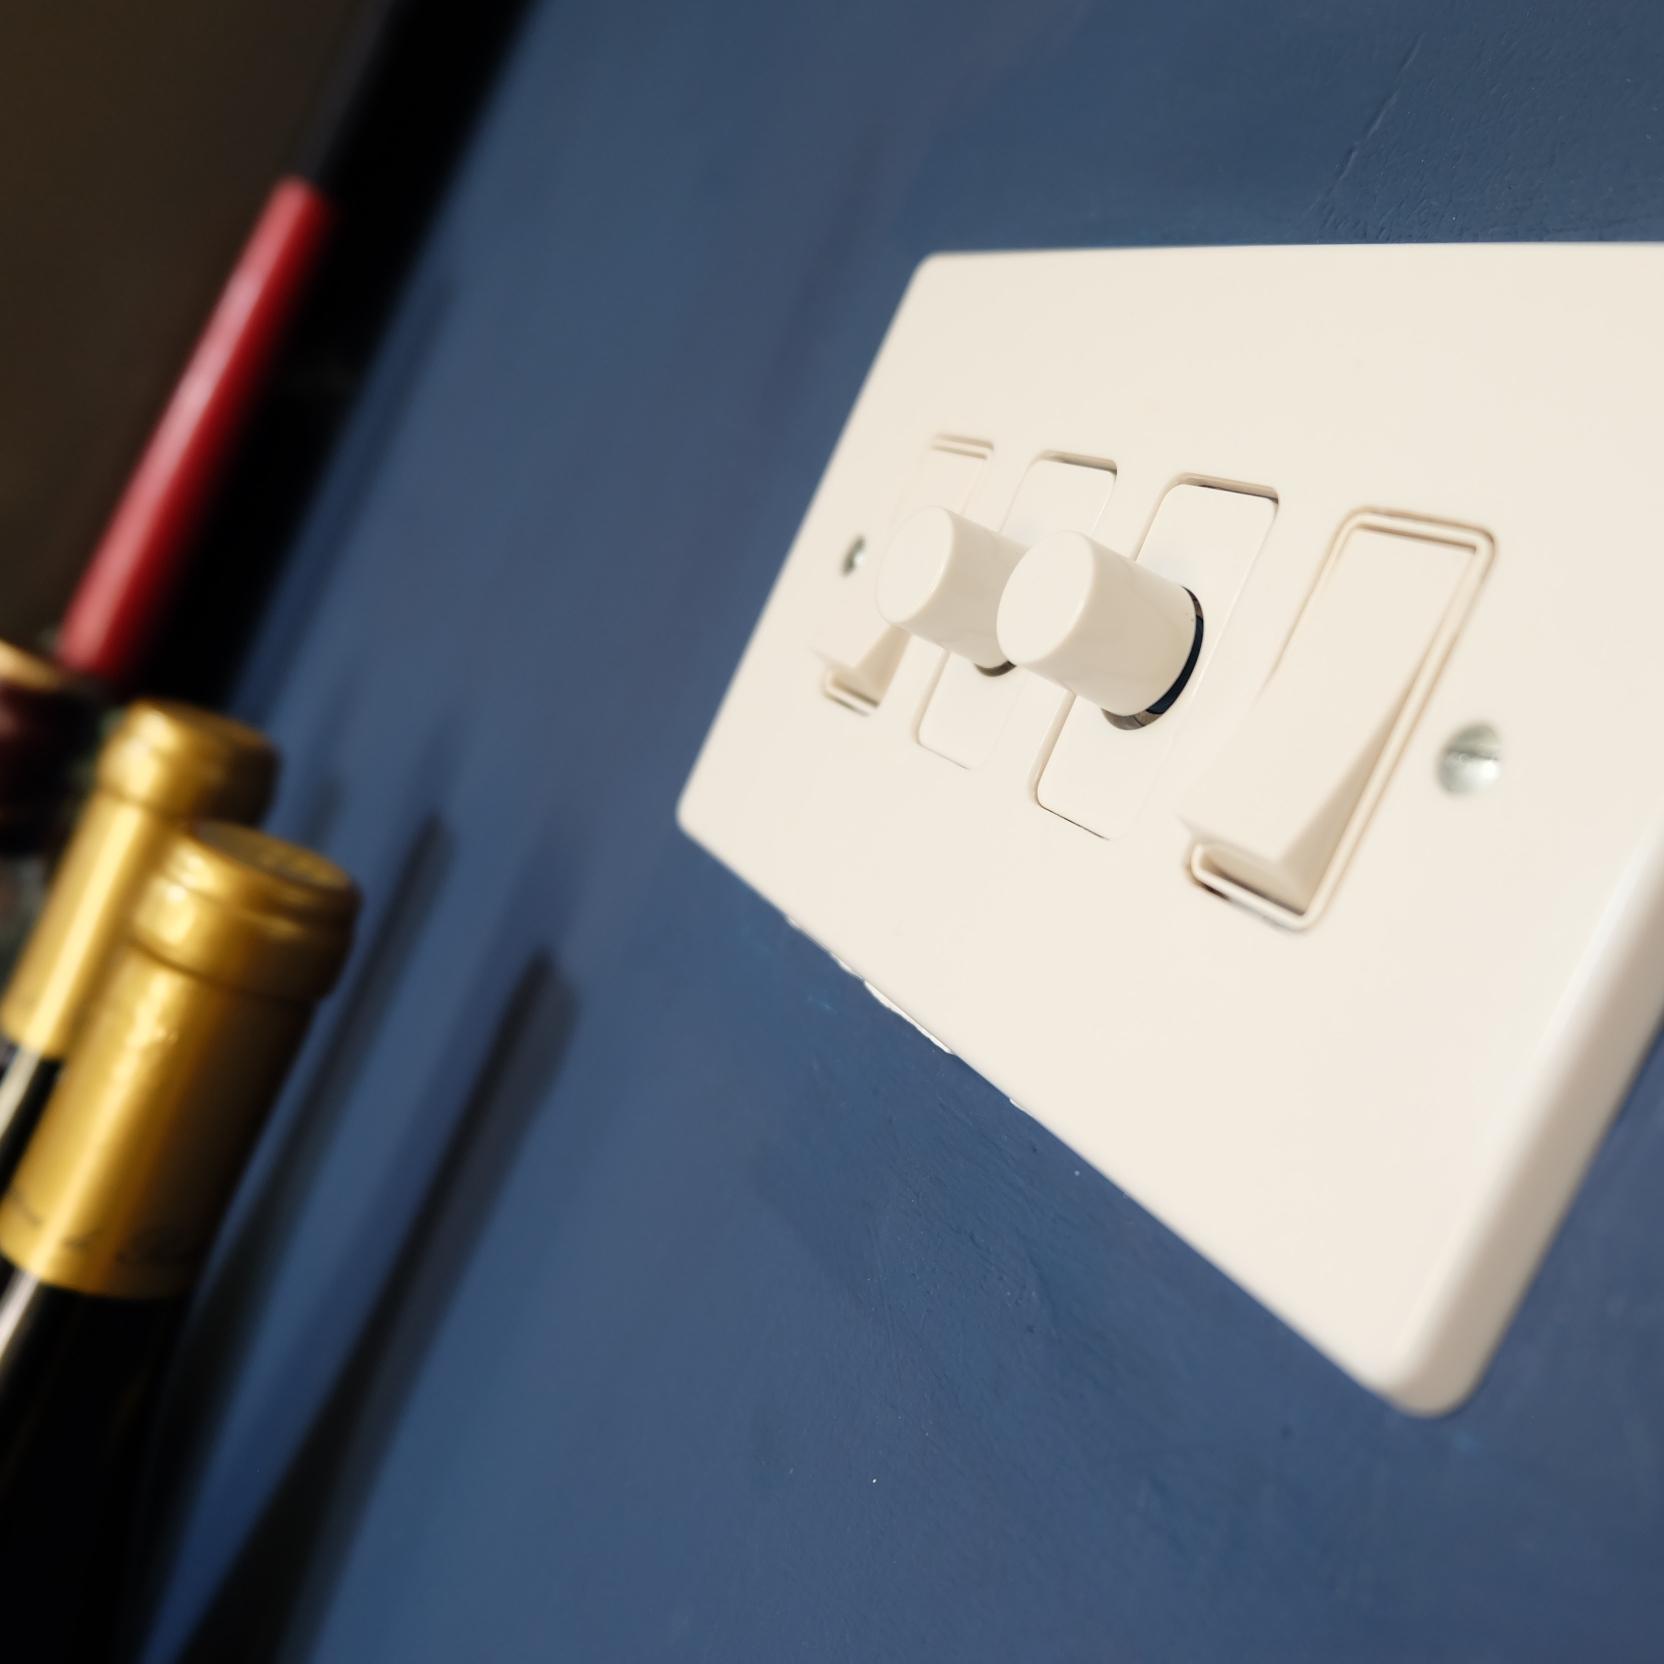 Light switch ergonomics 4